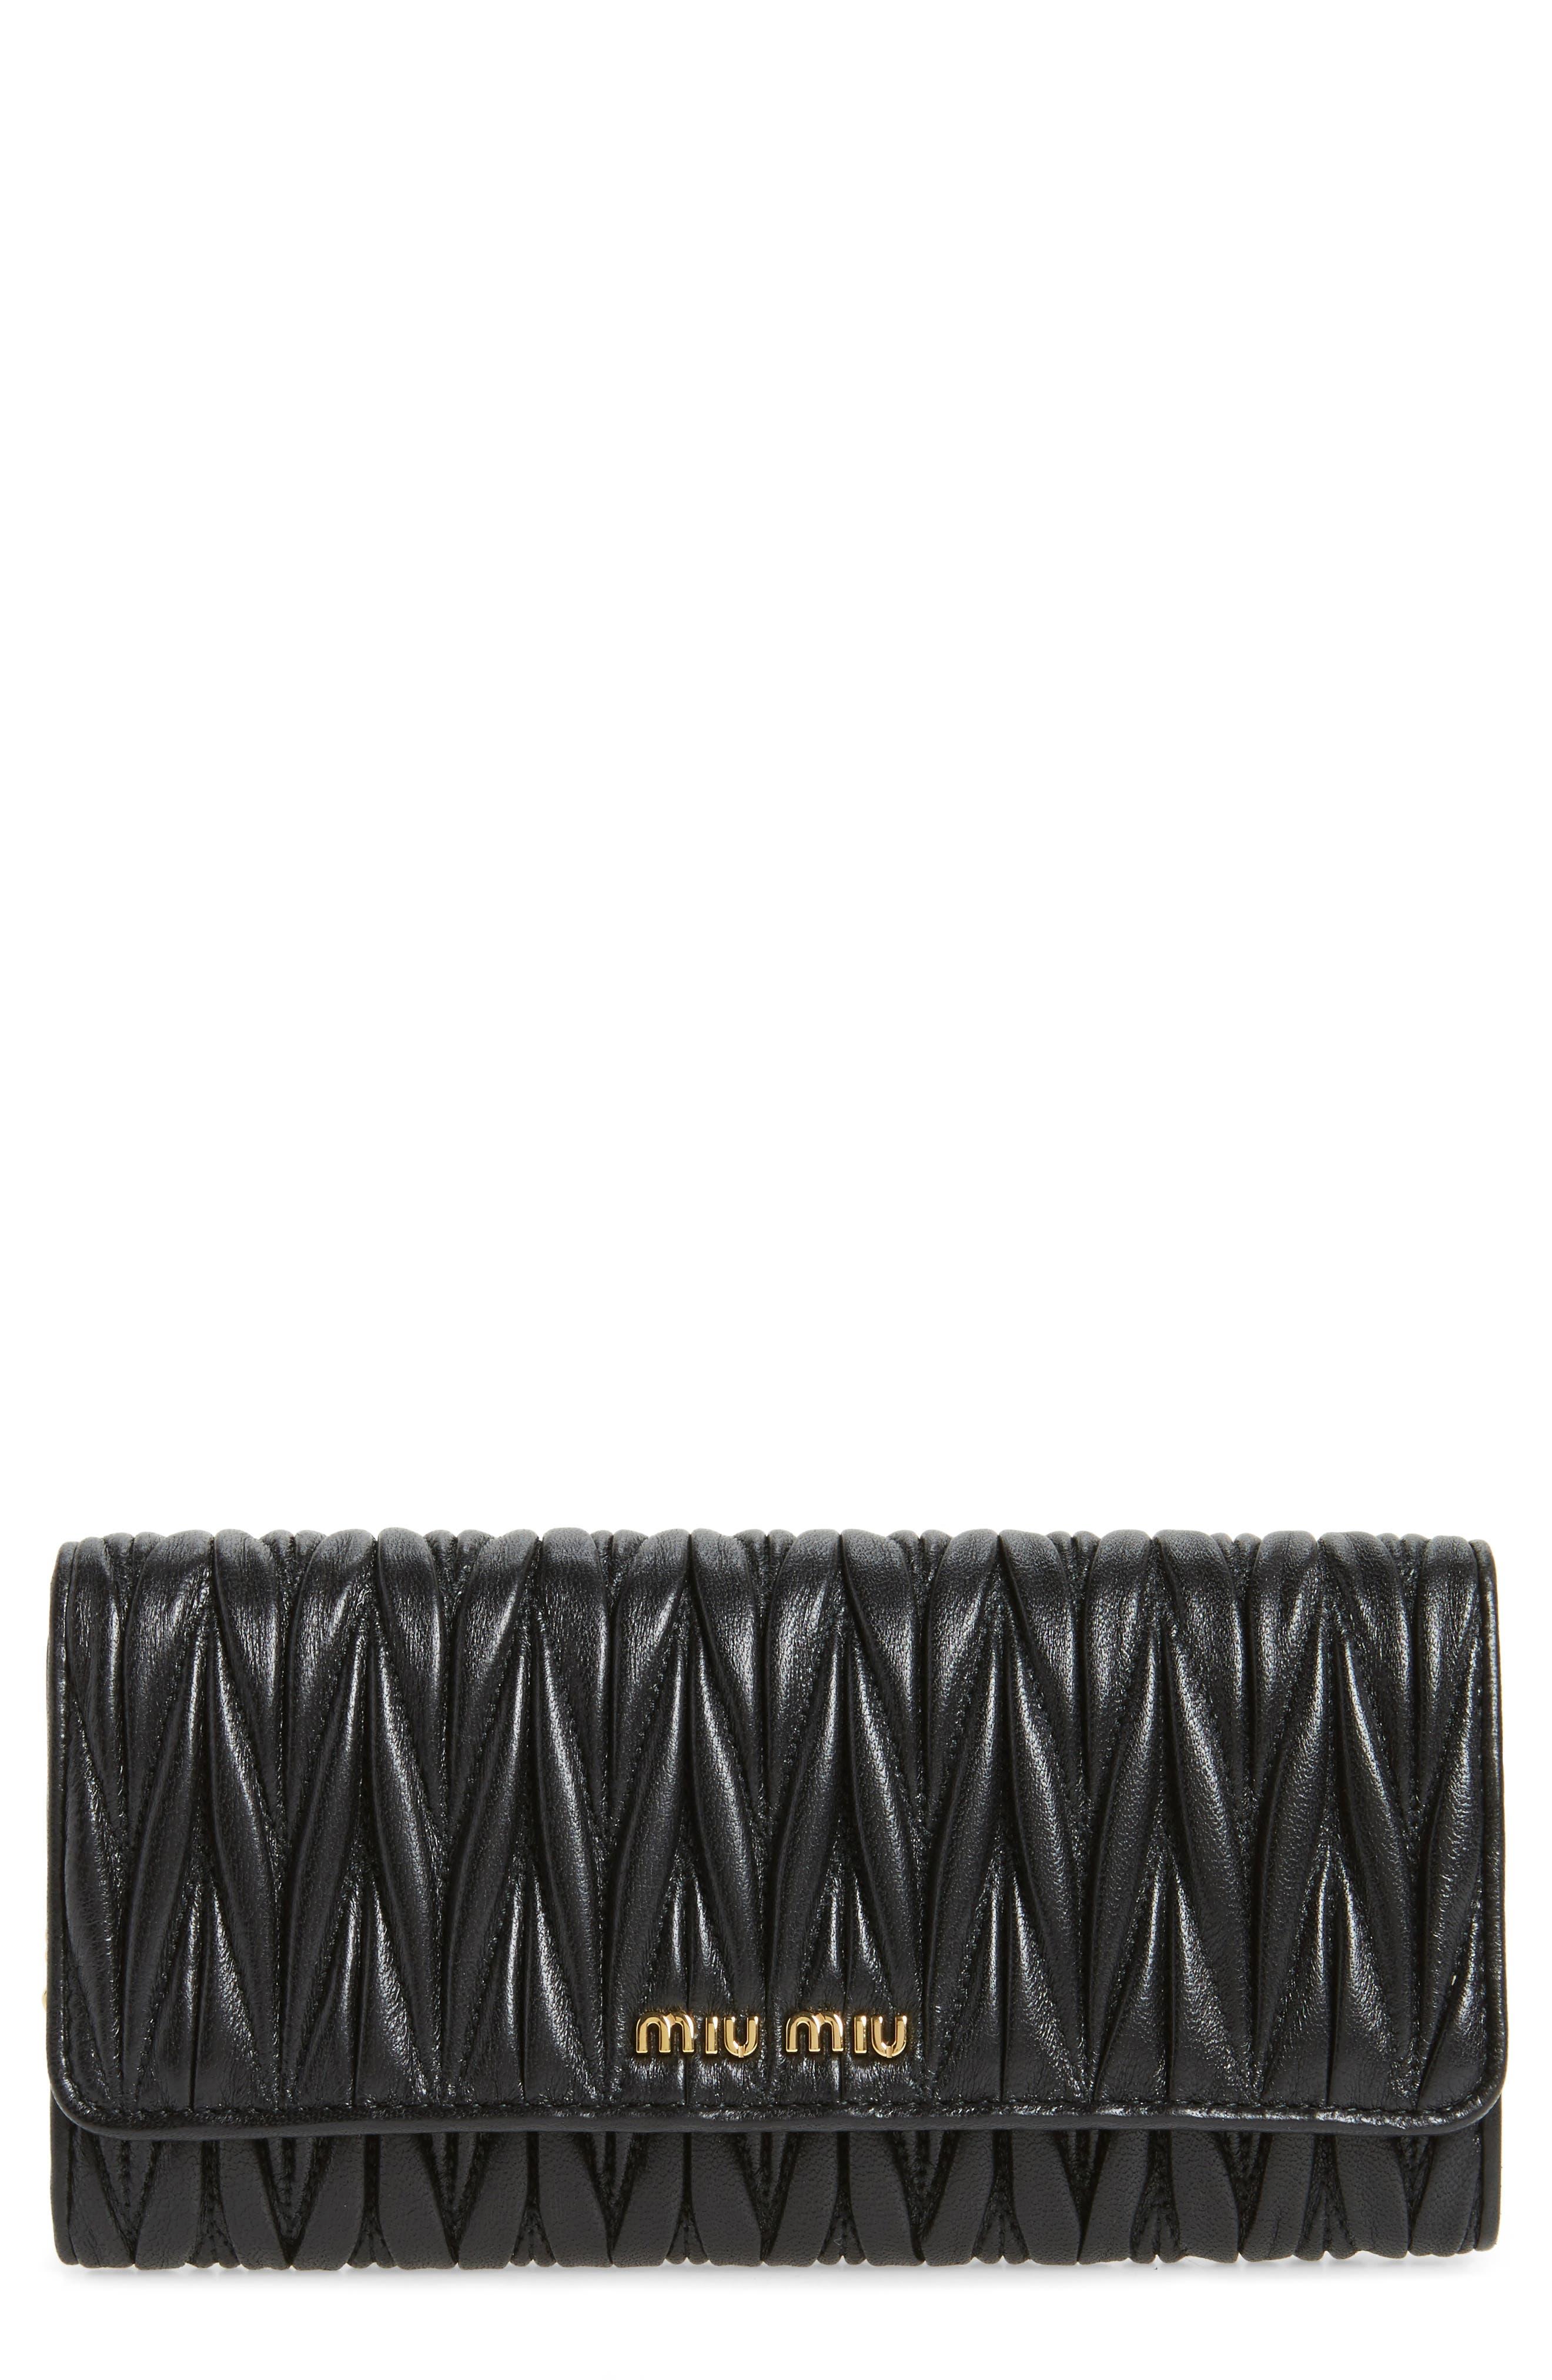 Alternate Image 1 Selected - Miu Miu Matelassé Leather Continental Wallet